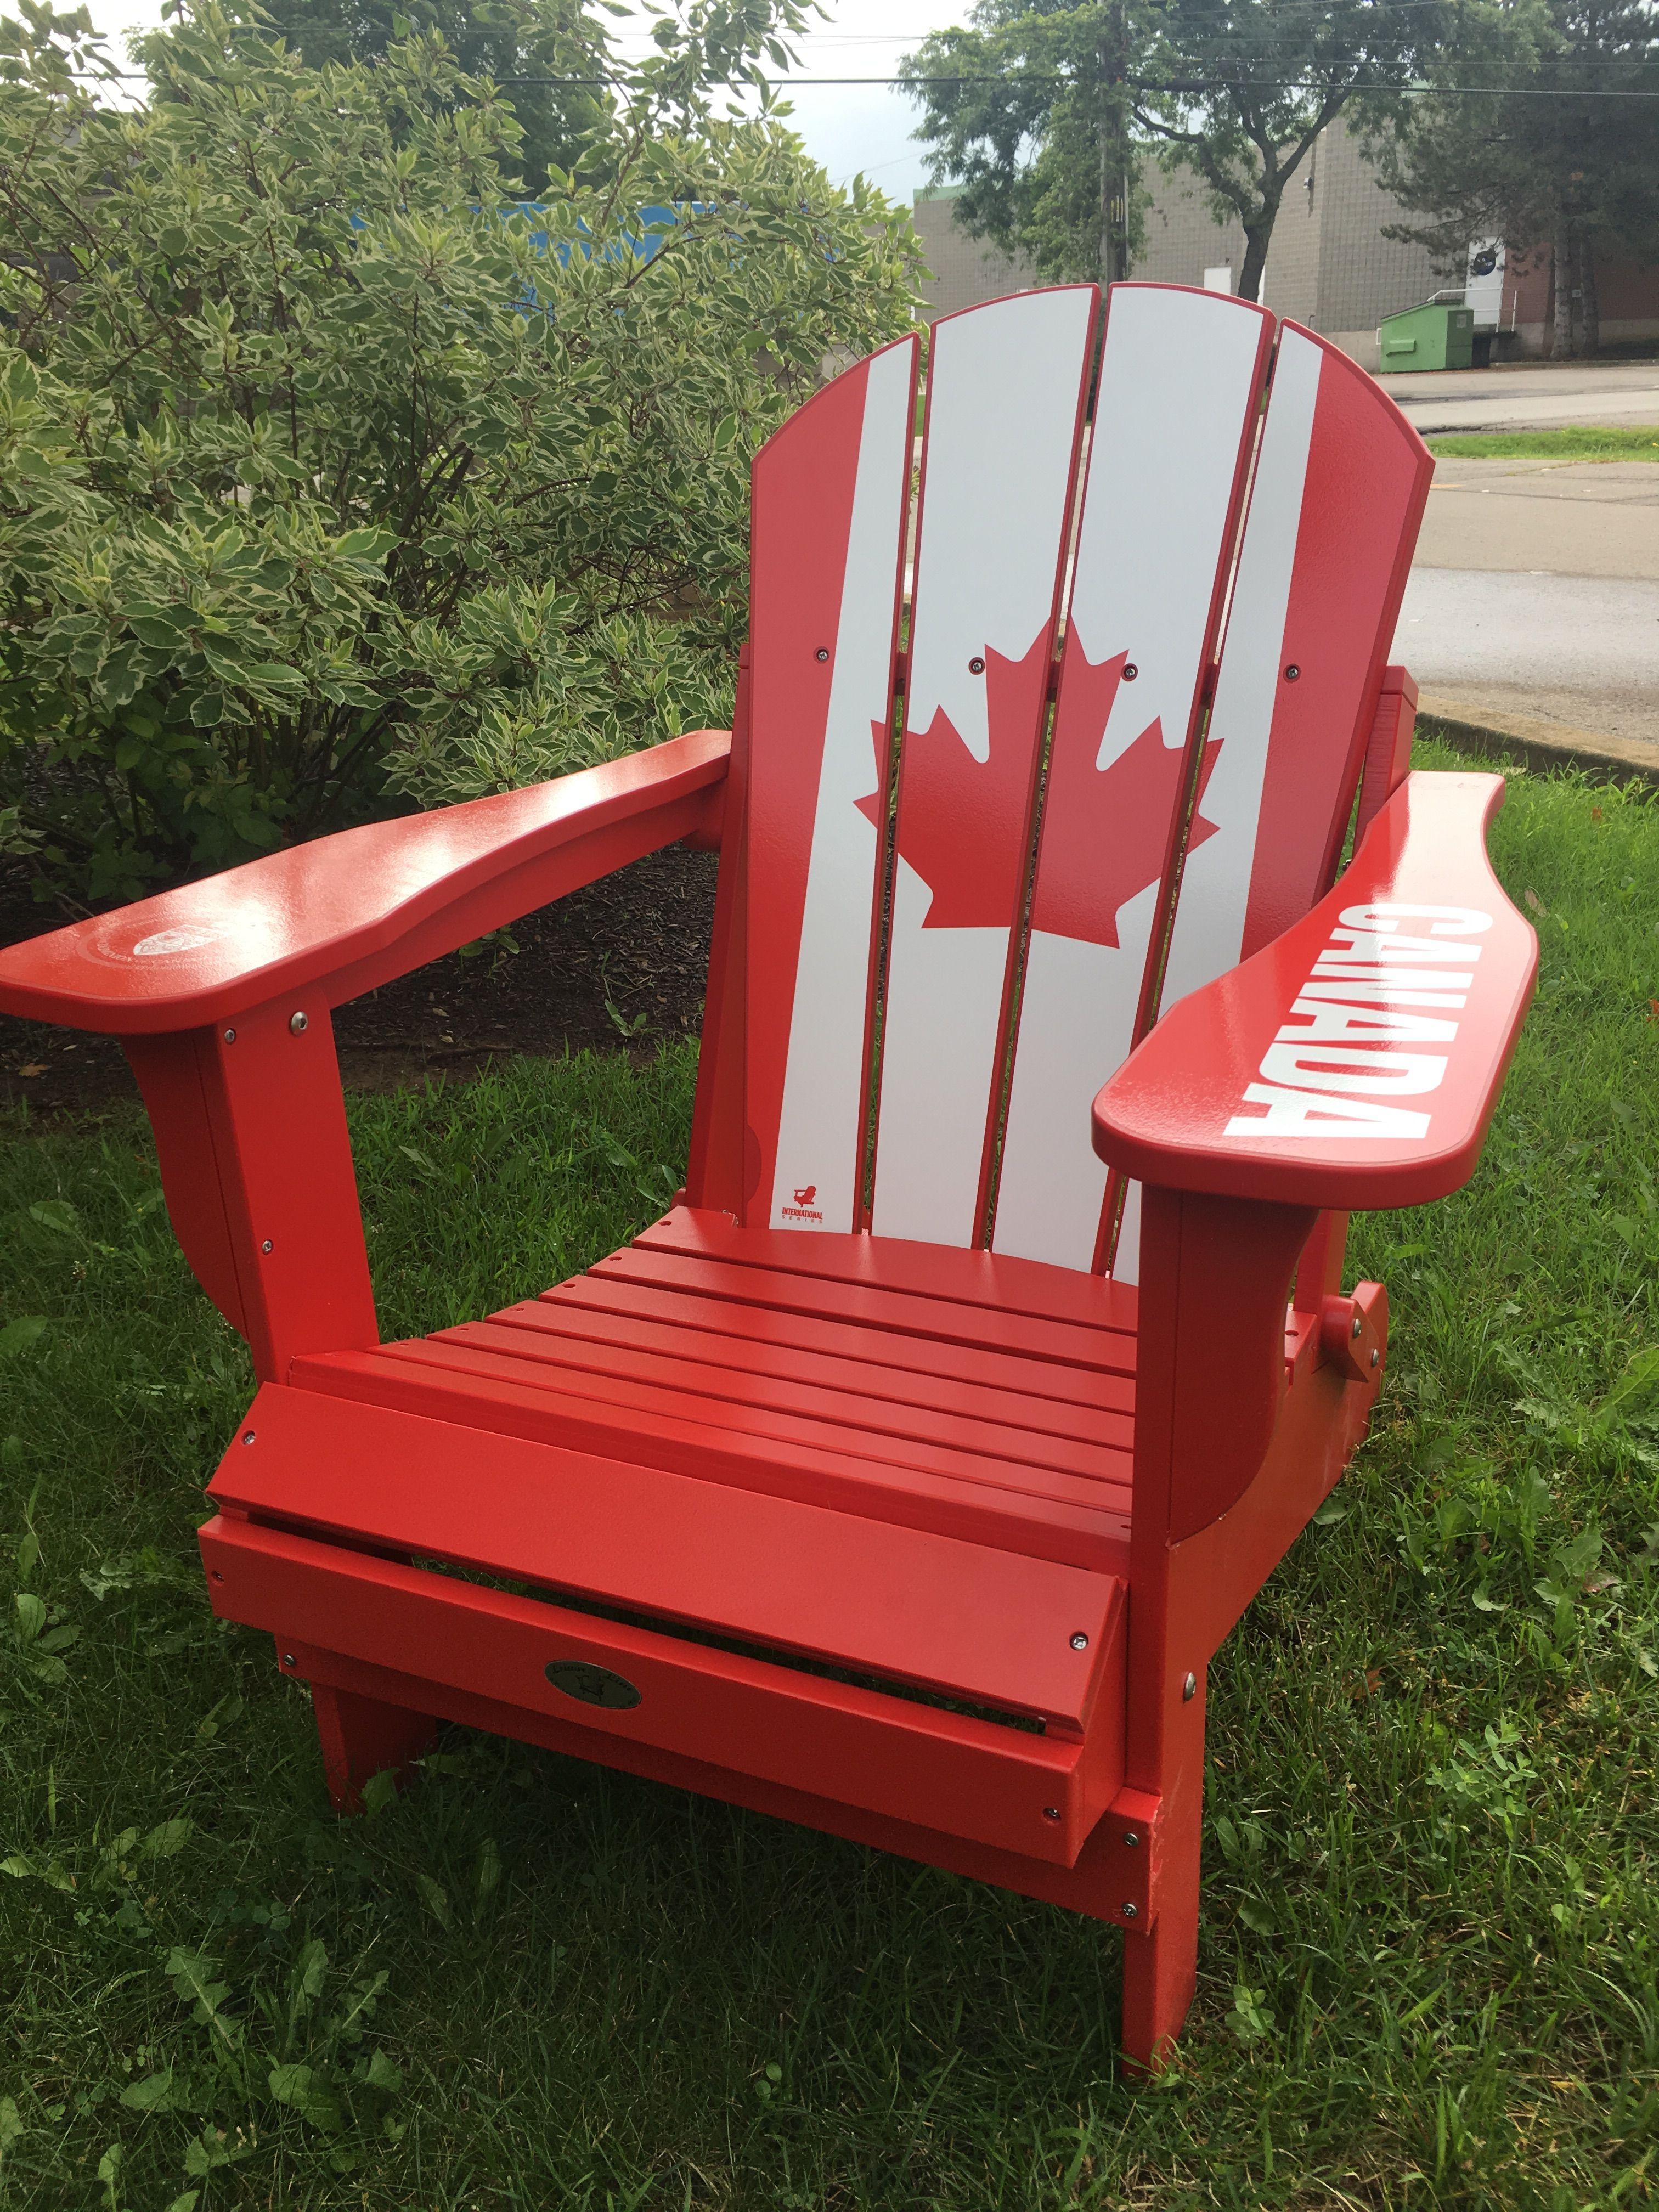 Swell Canada Flag Chair In 2019 Canada Flag Wood Crafts Creativecarmelina Interior Chair Design Creativecarmelinacom